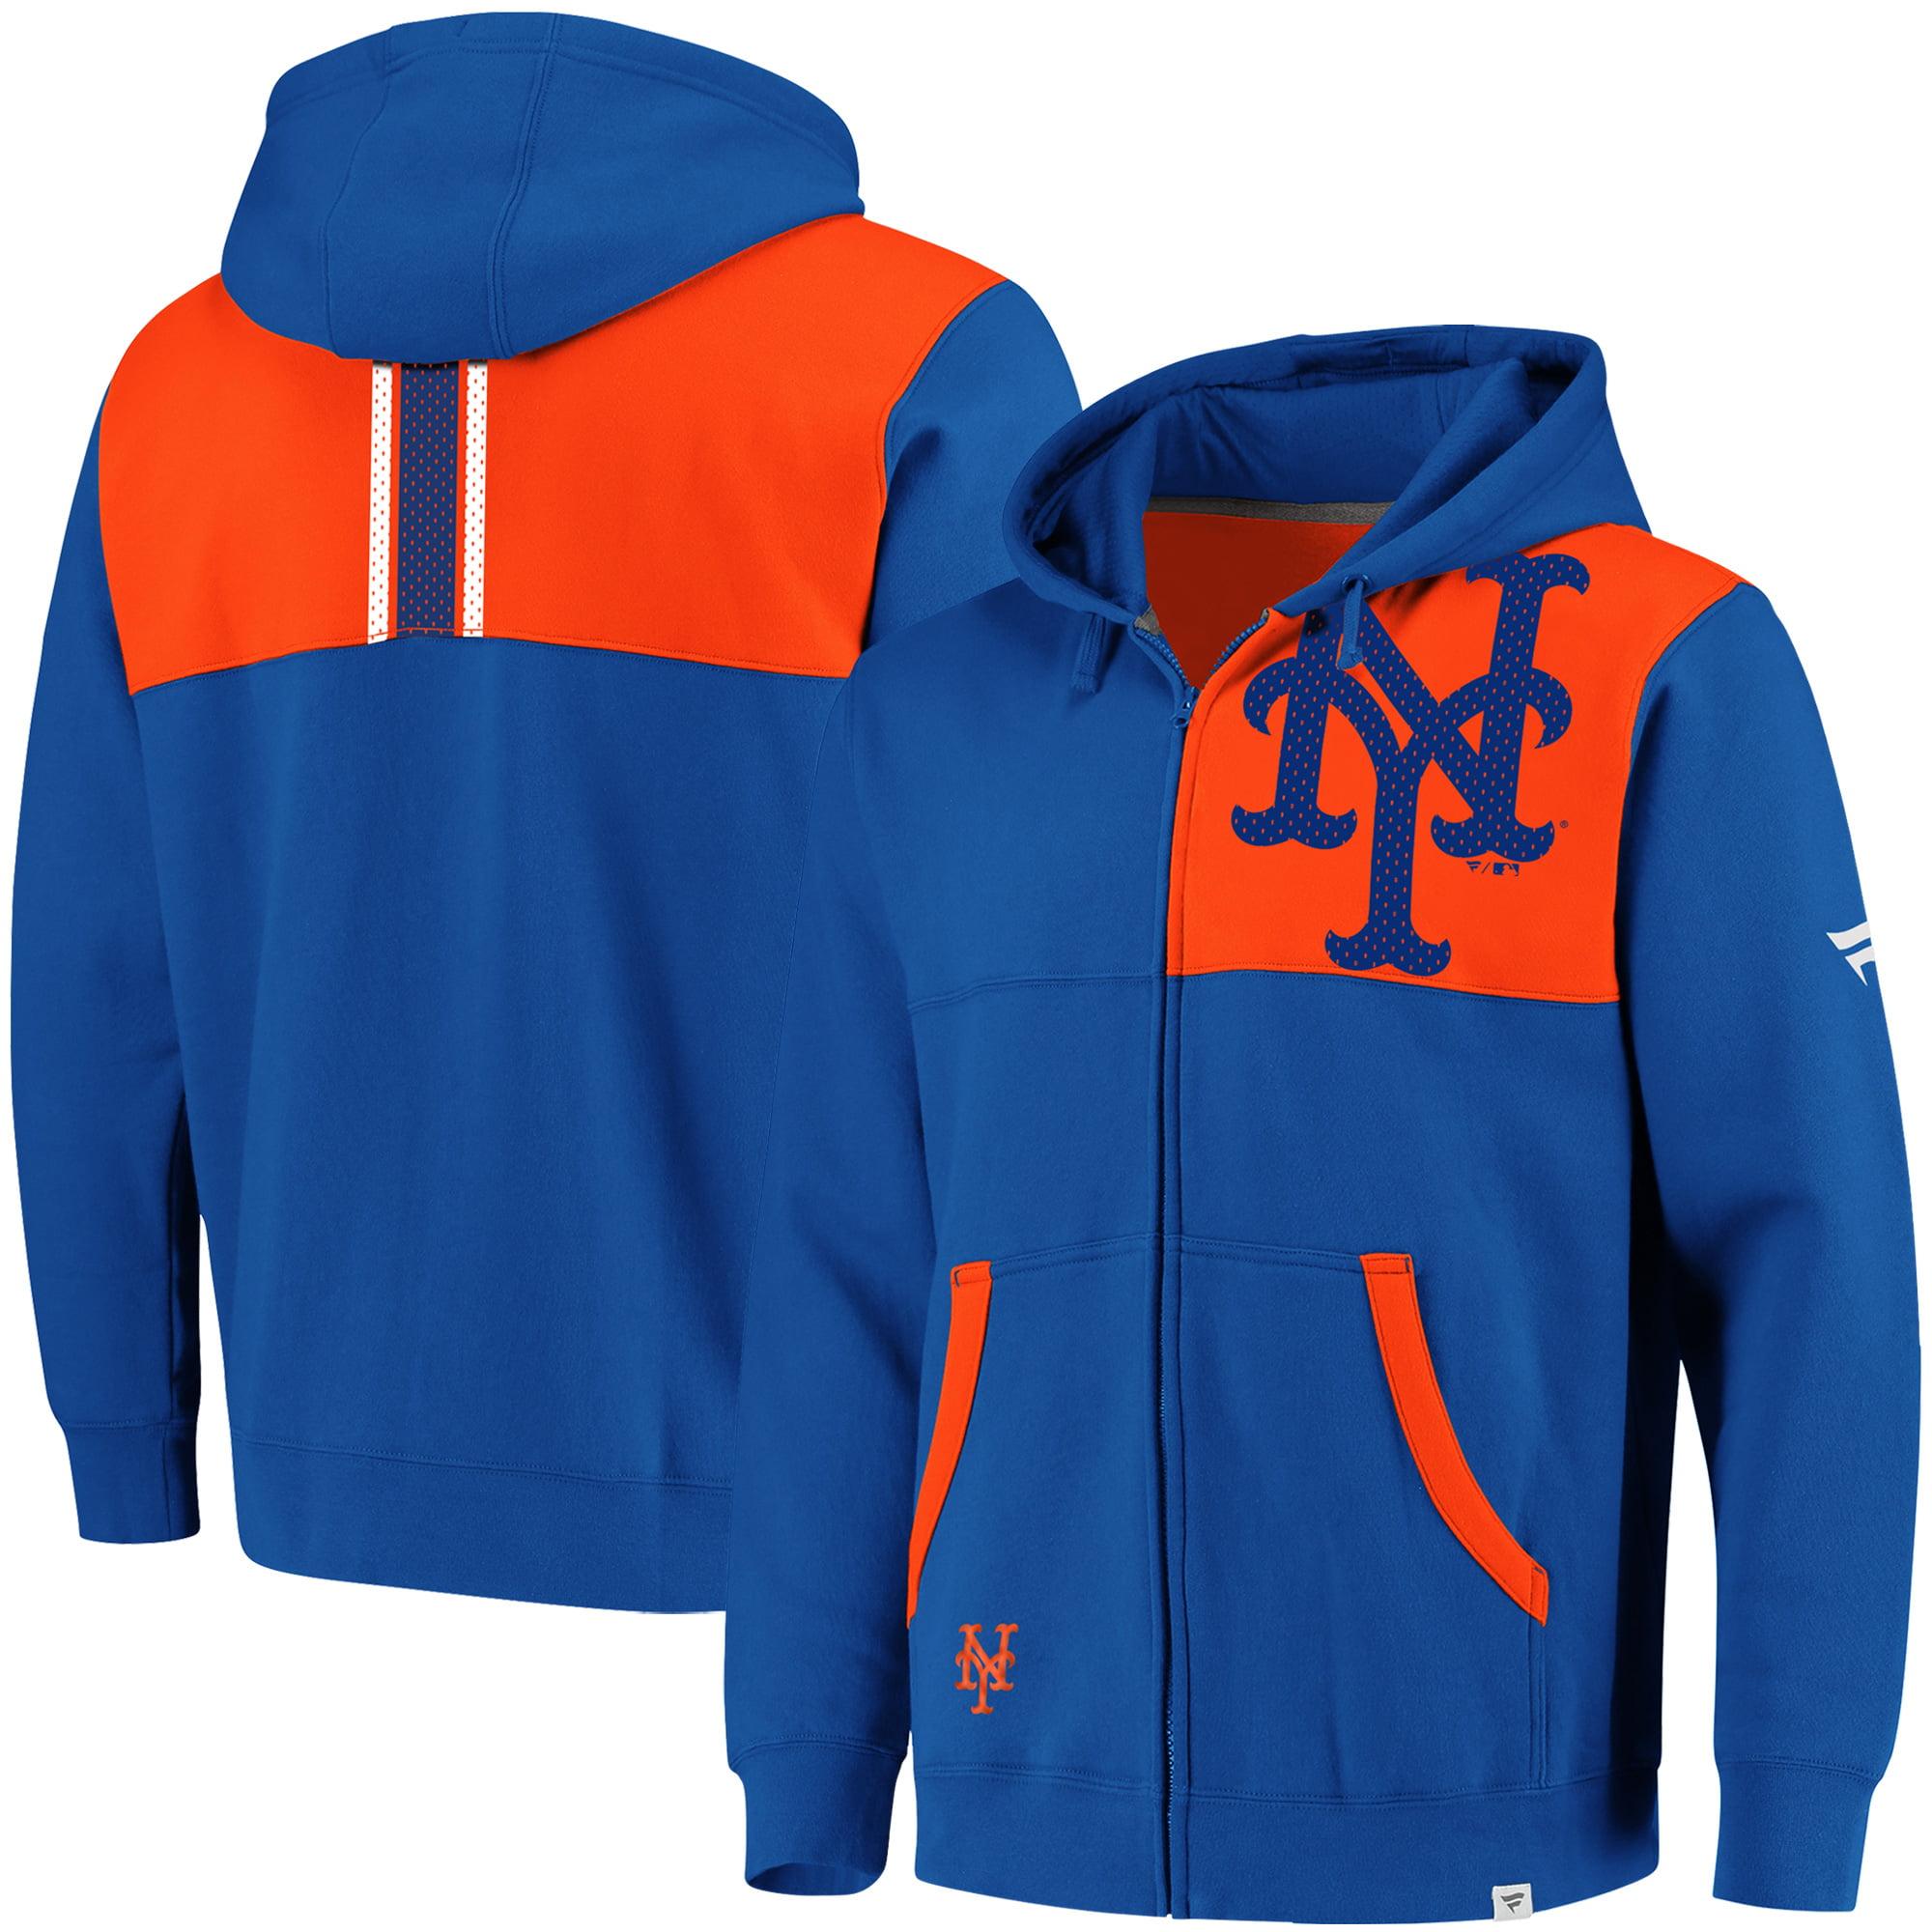 Men's Fanatics Branded Royal/Orange New York Mets Big & Tall Iconic Bold Full-Zip Hoodie